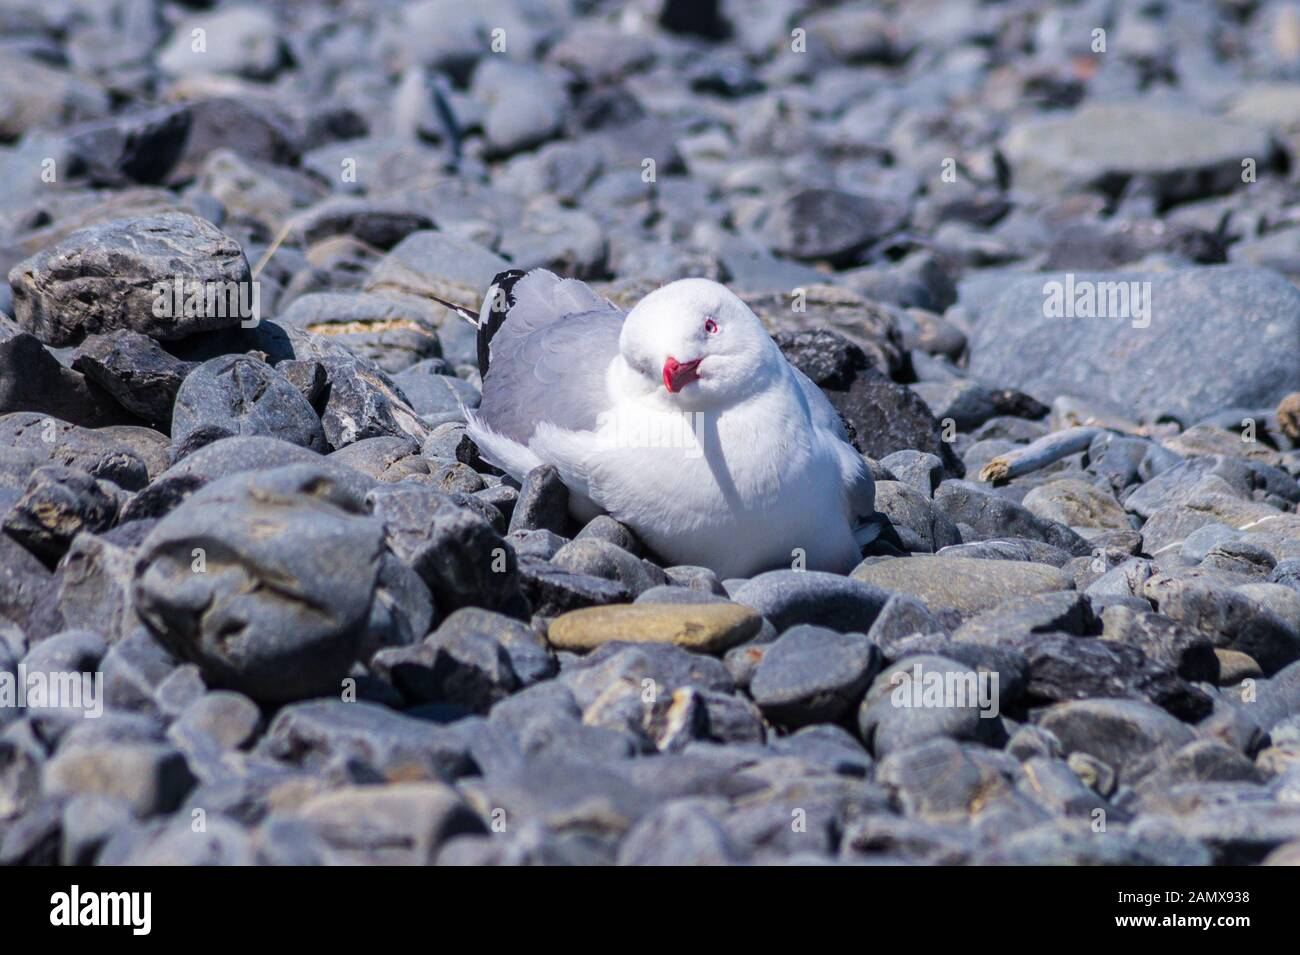 red-billed-gull-larus-scopulinus-cape-palliser-wairarapa-north-island-new-zealand-2AMX938.jpg